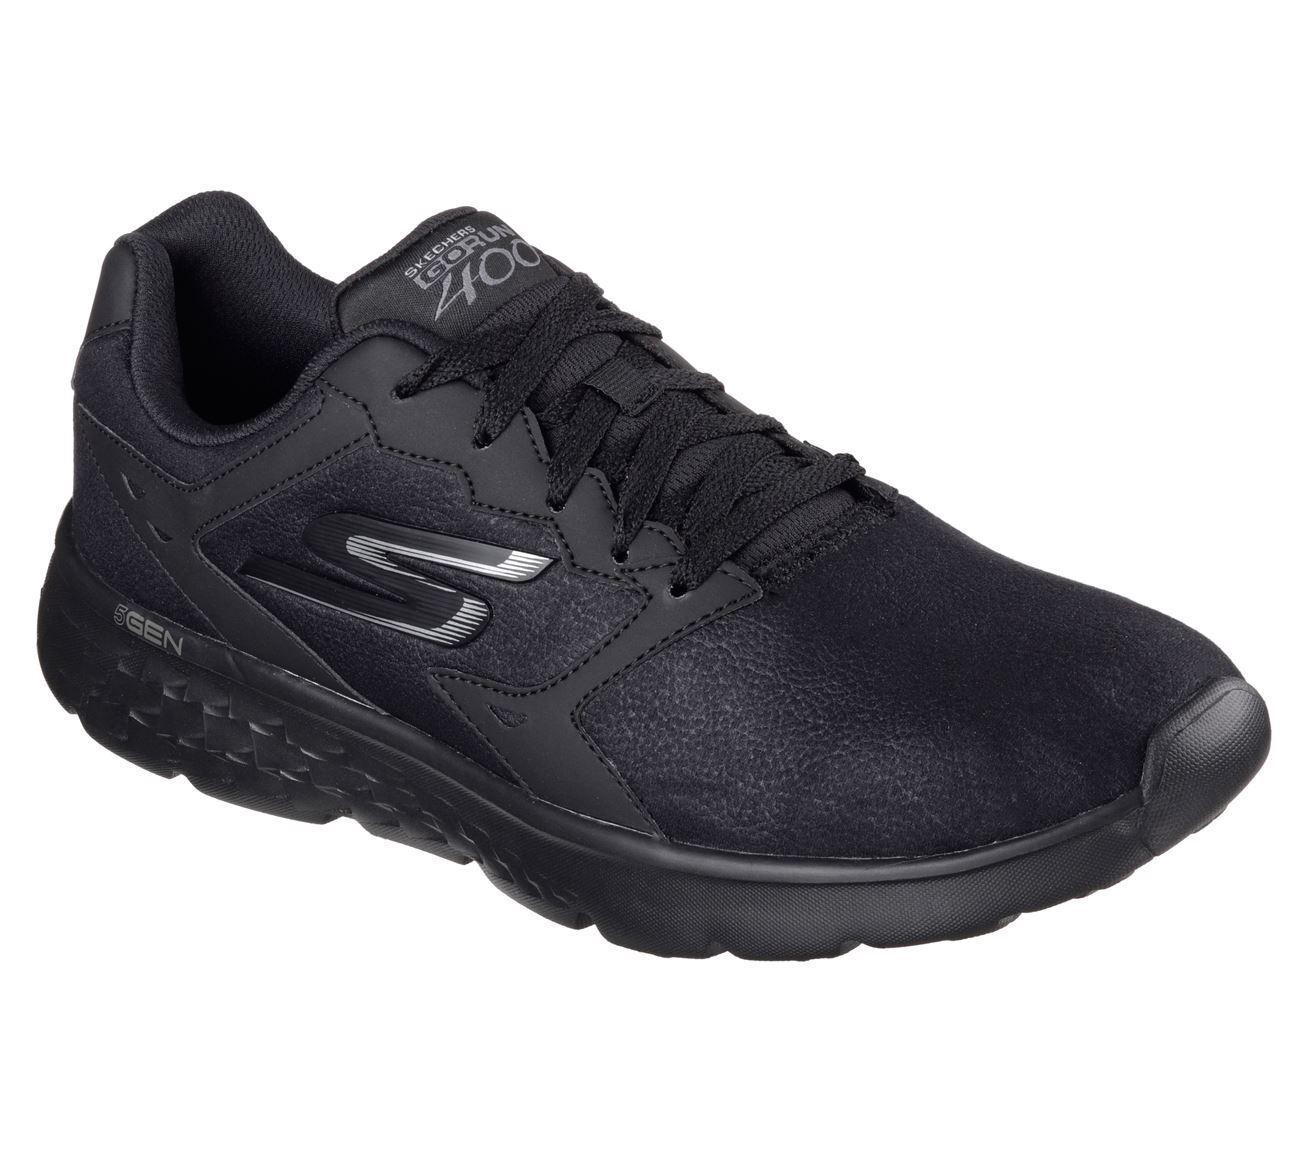 Skechers Hombre Gorun 400 - accellerate Zapatillas running black,size